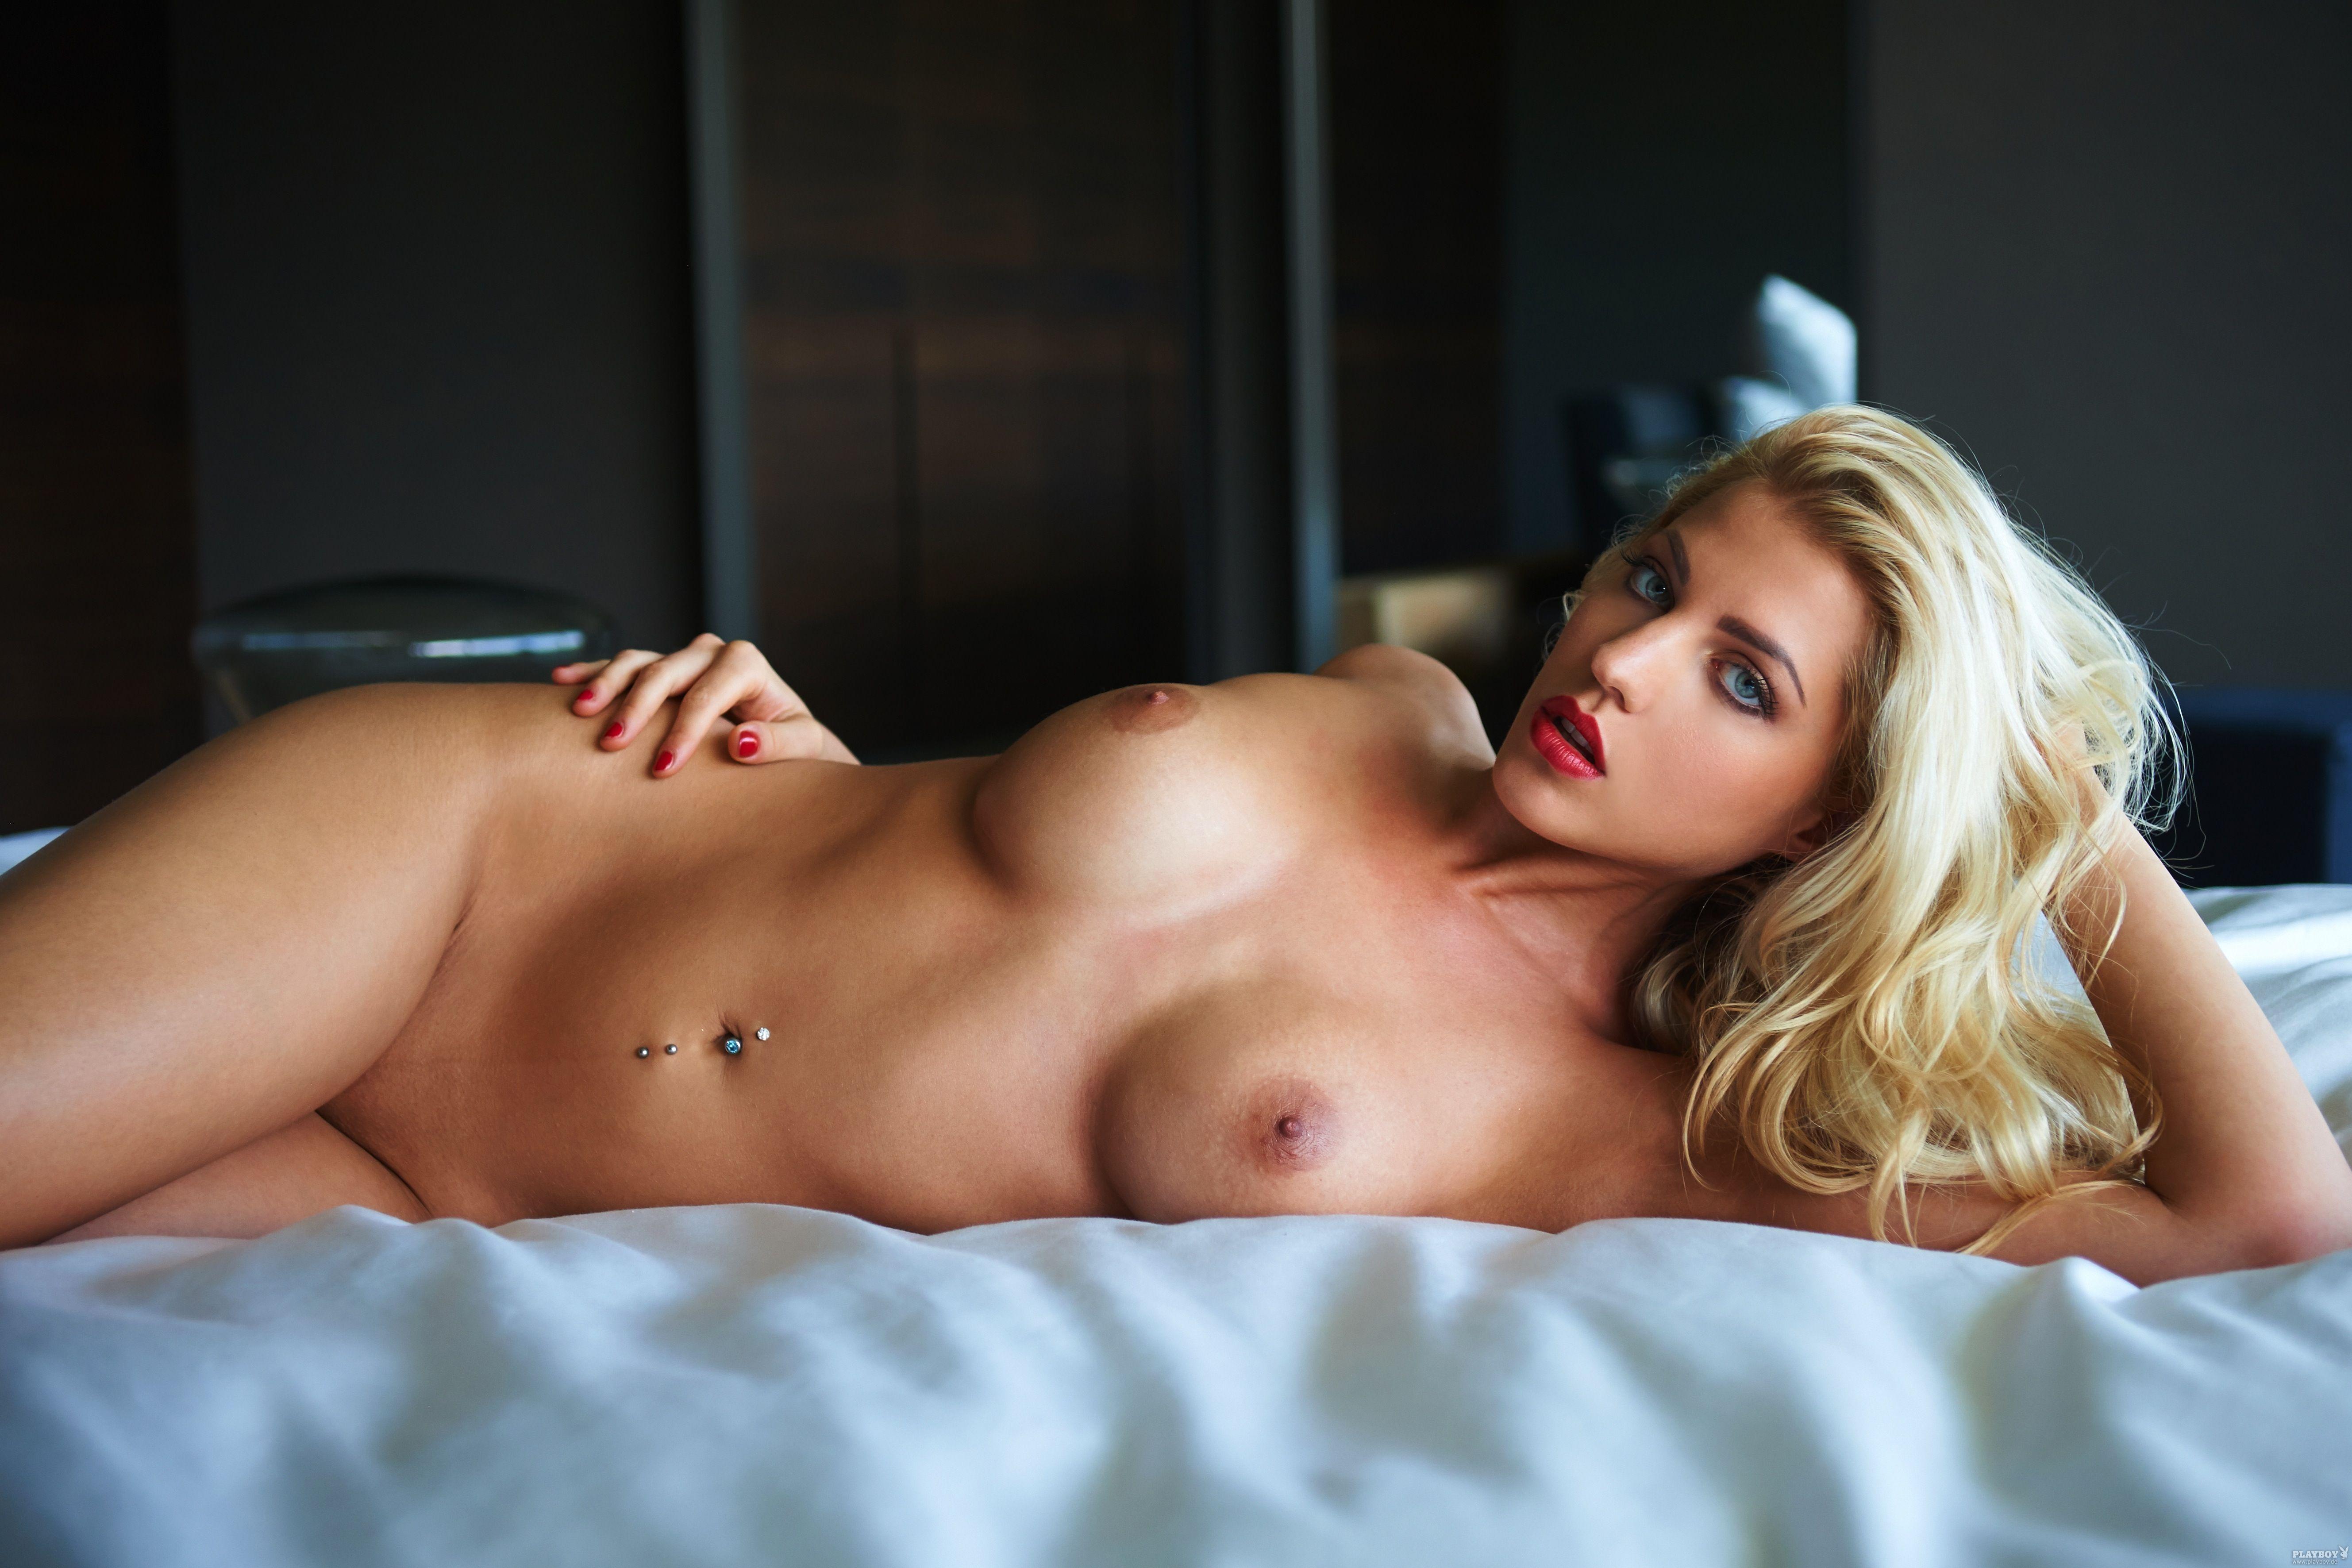 Natalia velez nude, close up black gir pussy fucking